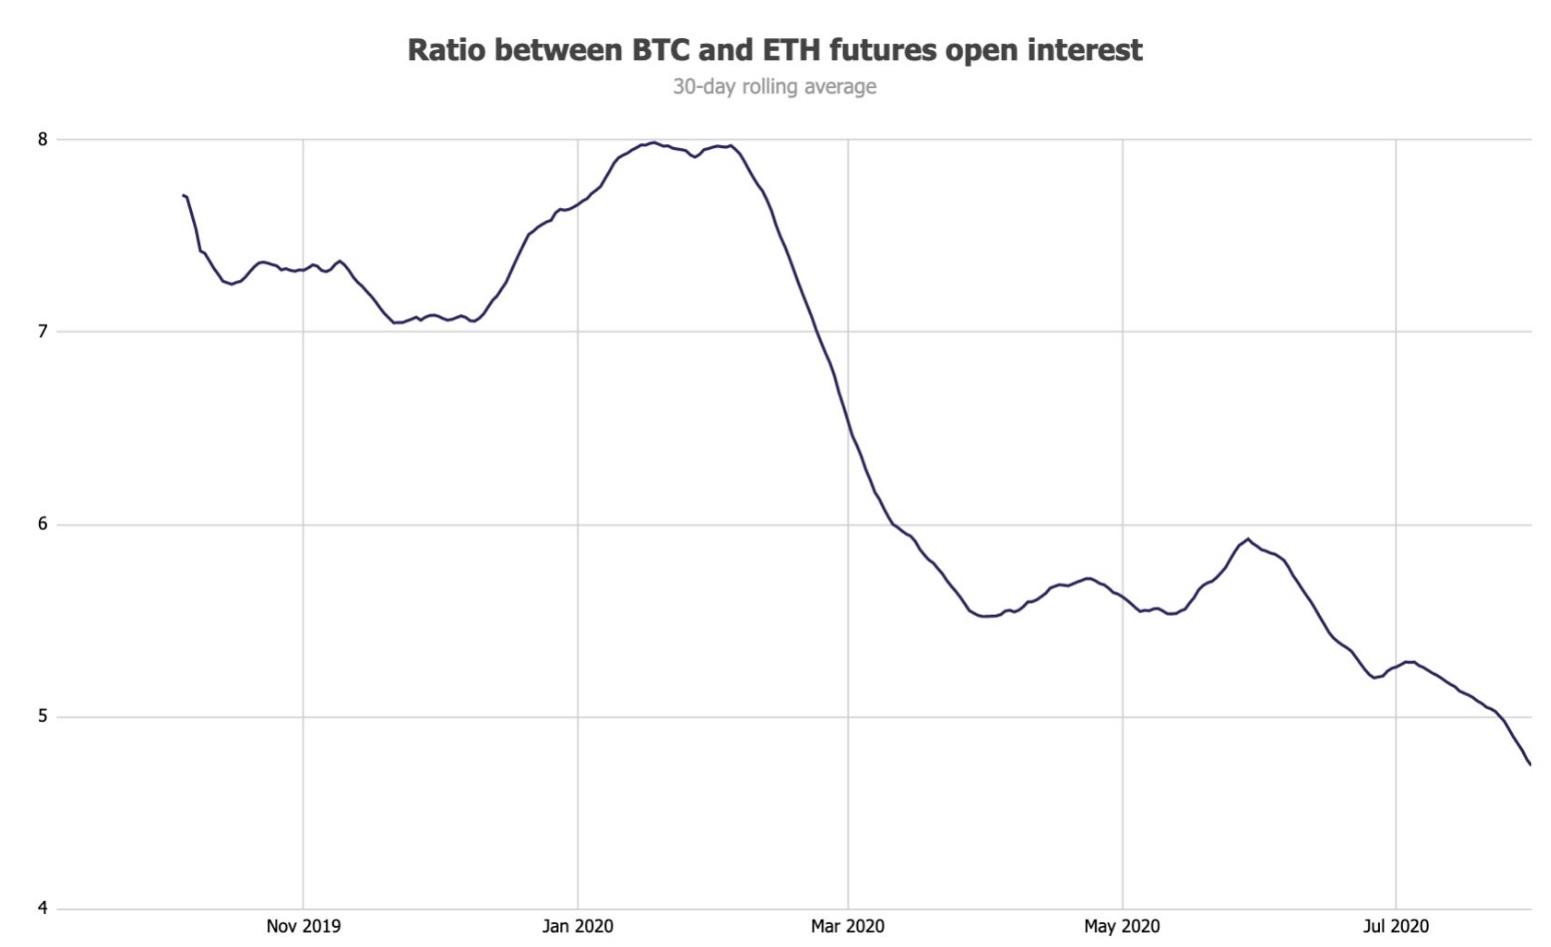 Ethereum futures open interest reaches $1.5 billion